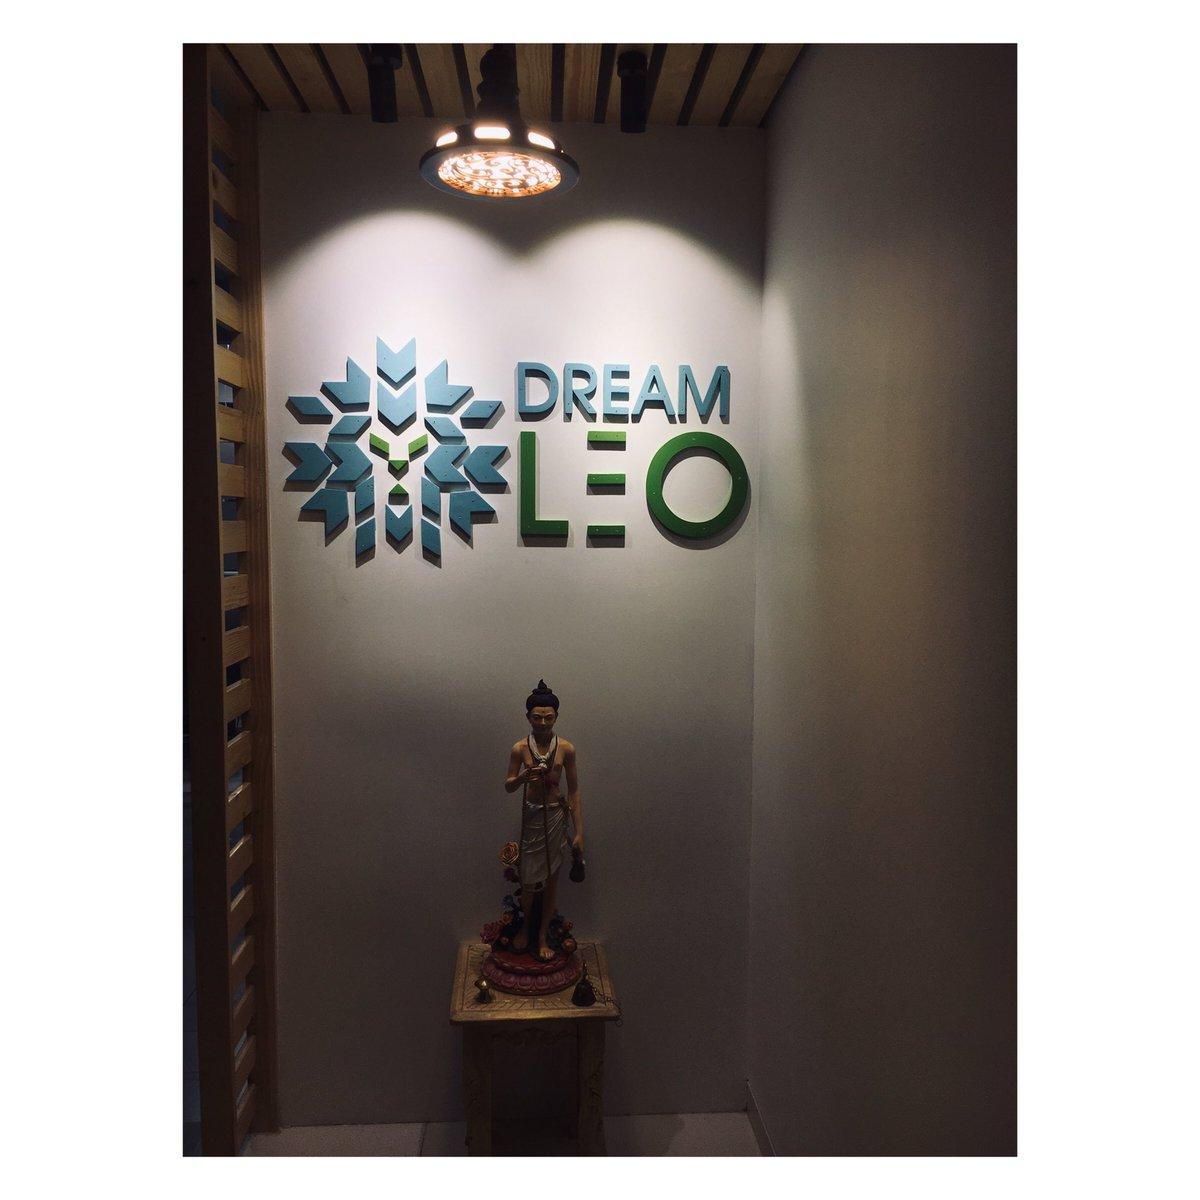 "DREAM LEO WEB SOLUTIONS ""We Make Your DREAMs Come True""#development #designing #website #websitedesign #webdeveloper #webdevelopment #laravel #codeigniter #dreamleo #websolutions #php #photoshop #india #ahmedabad #gujarat #london #uk #us #unitedstates #unitedkingdom  #bulksms"